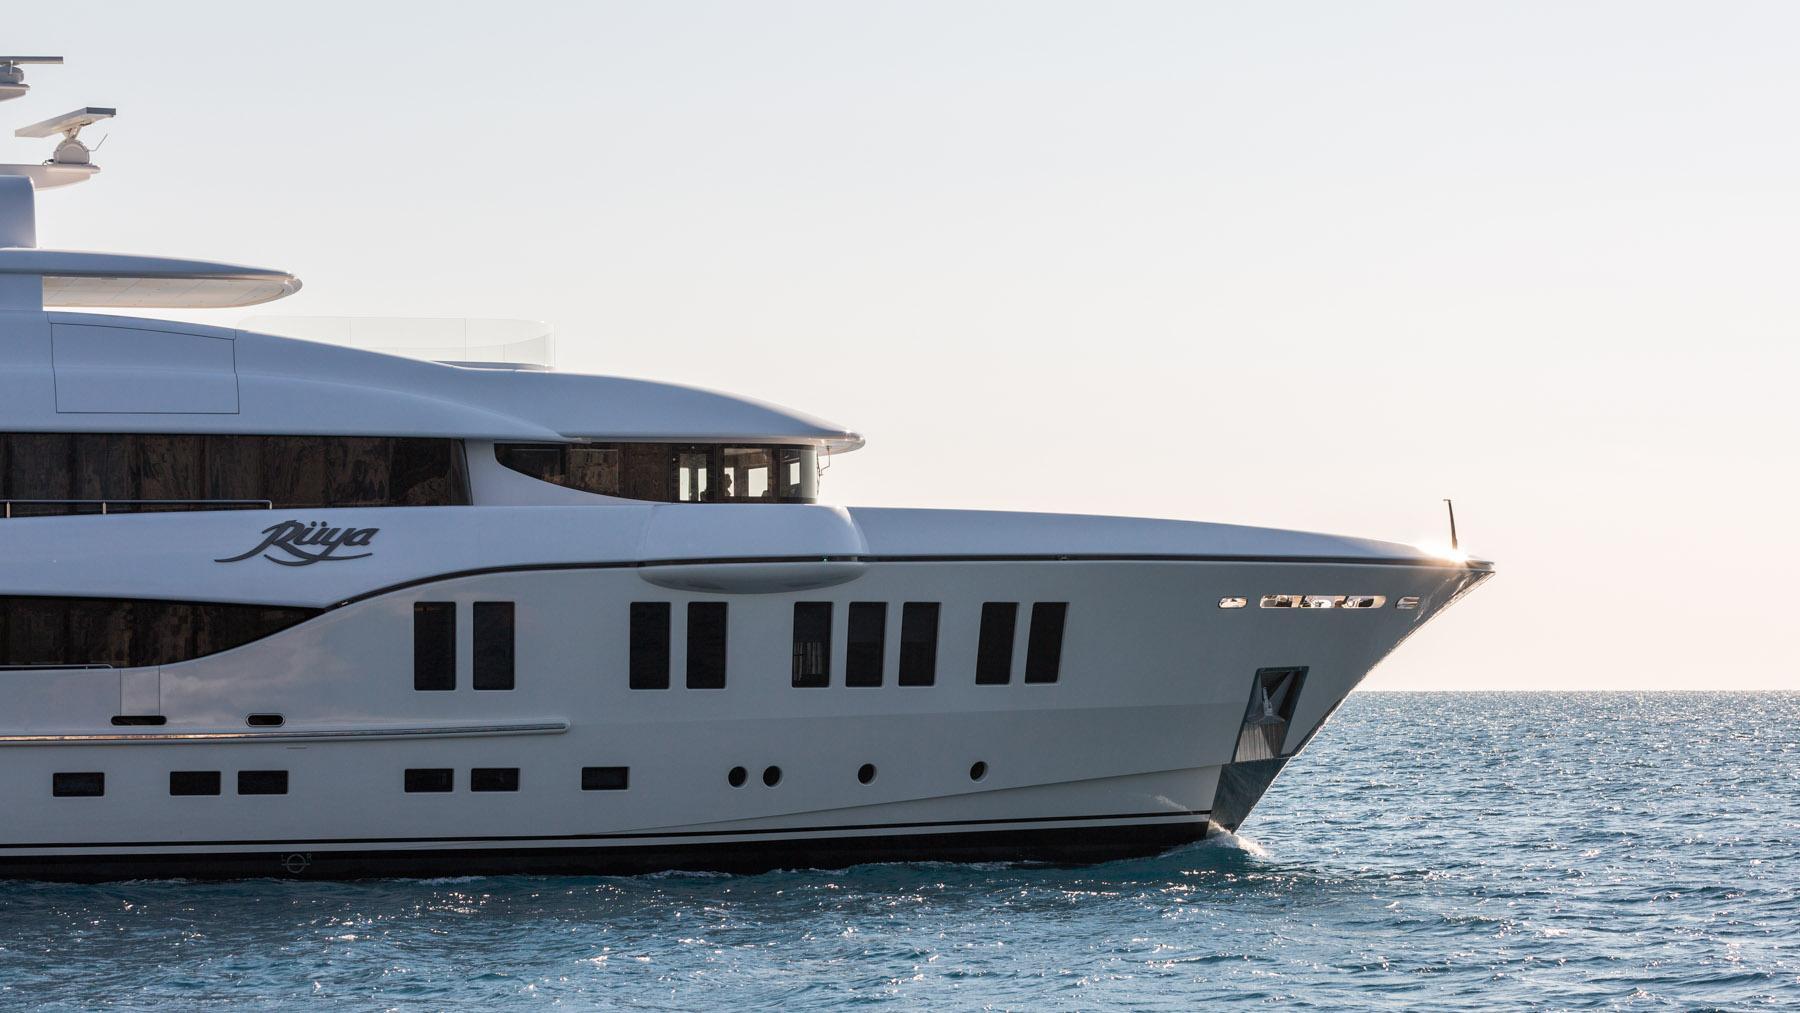 ruya-yacht-profile-zoom-exterior